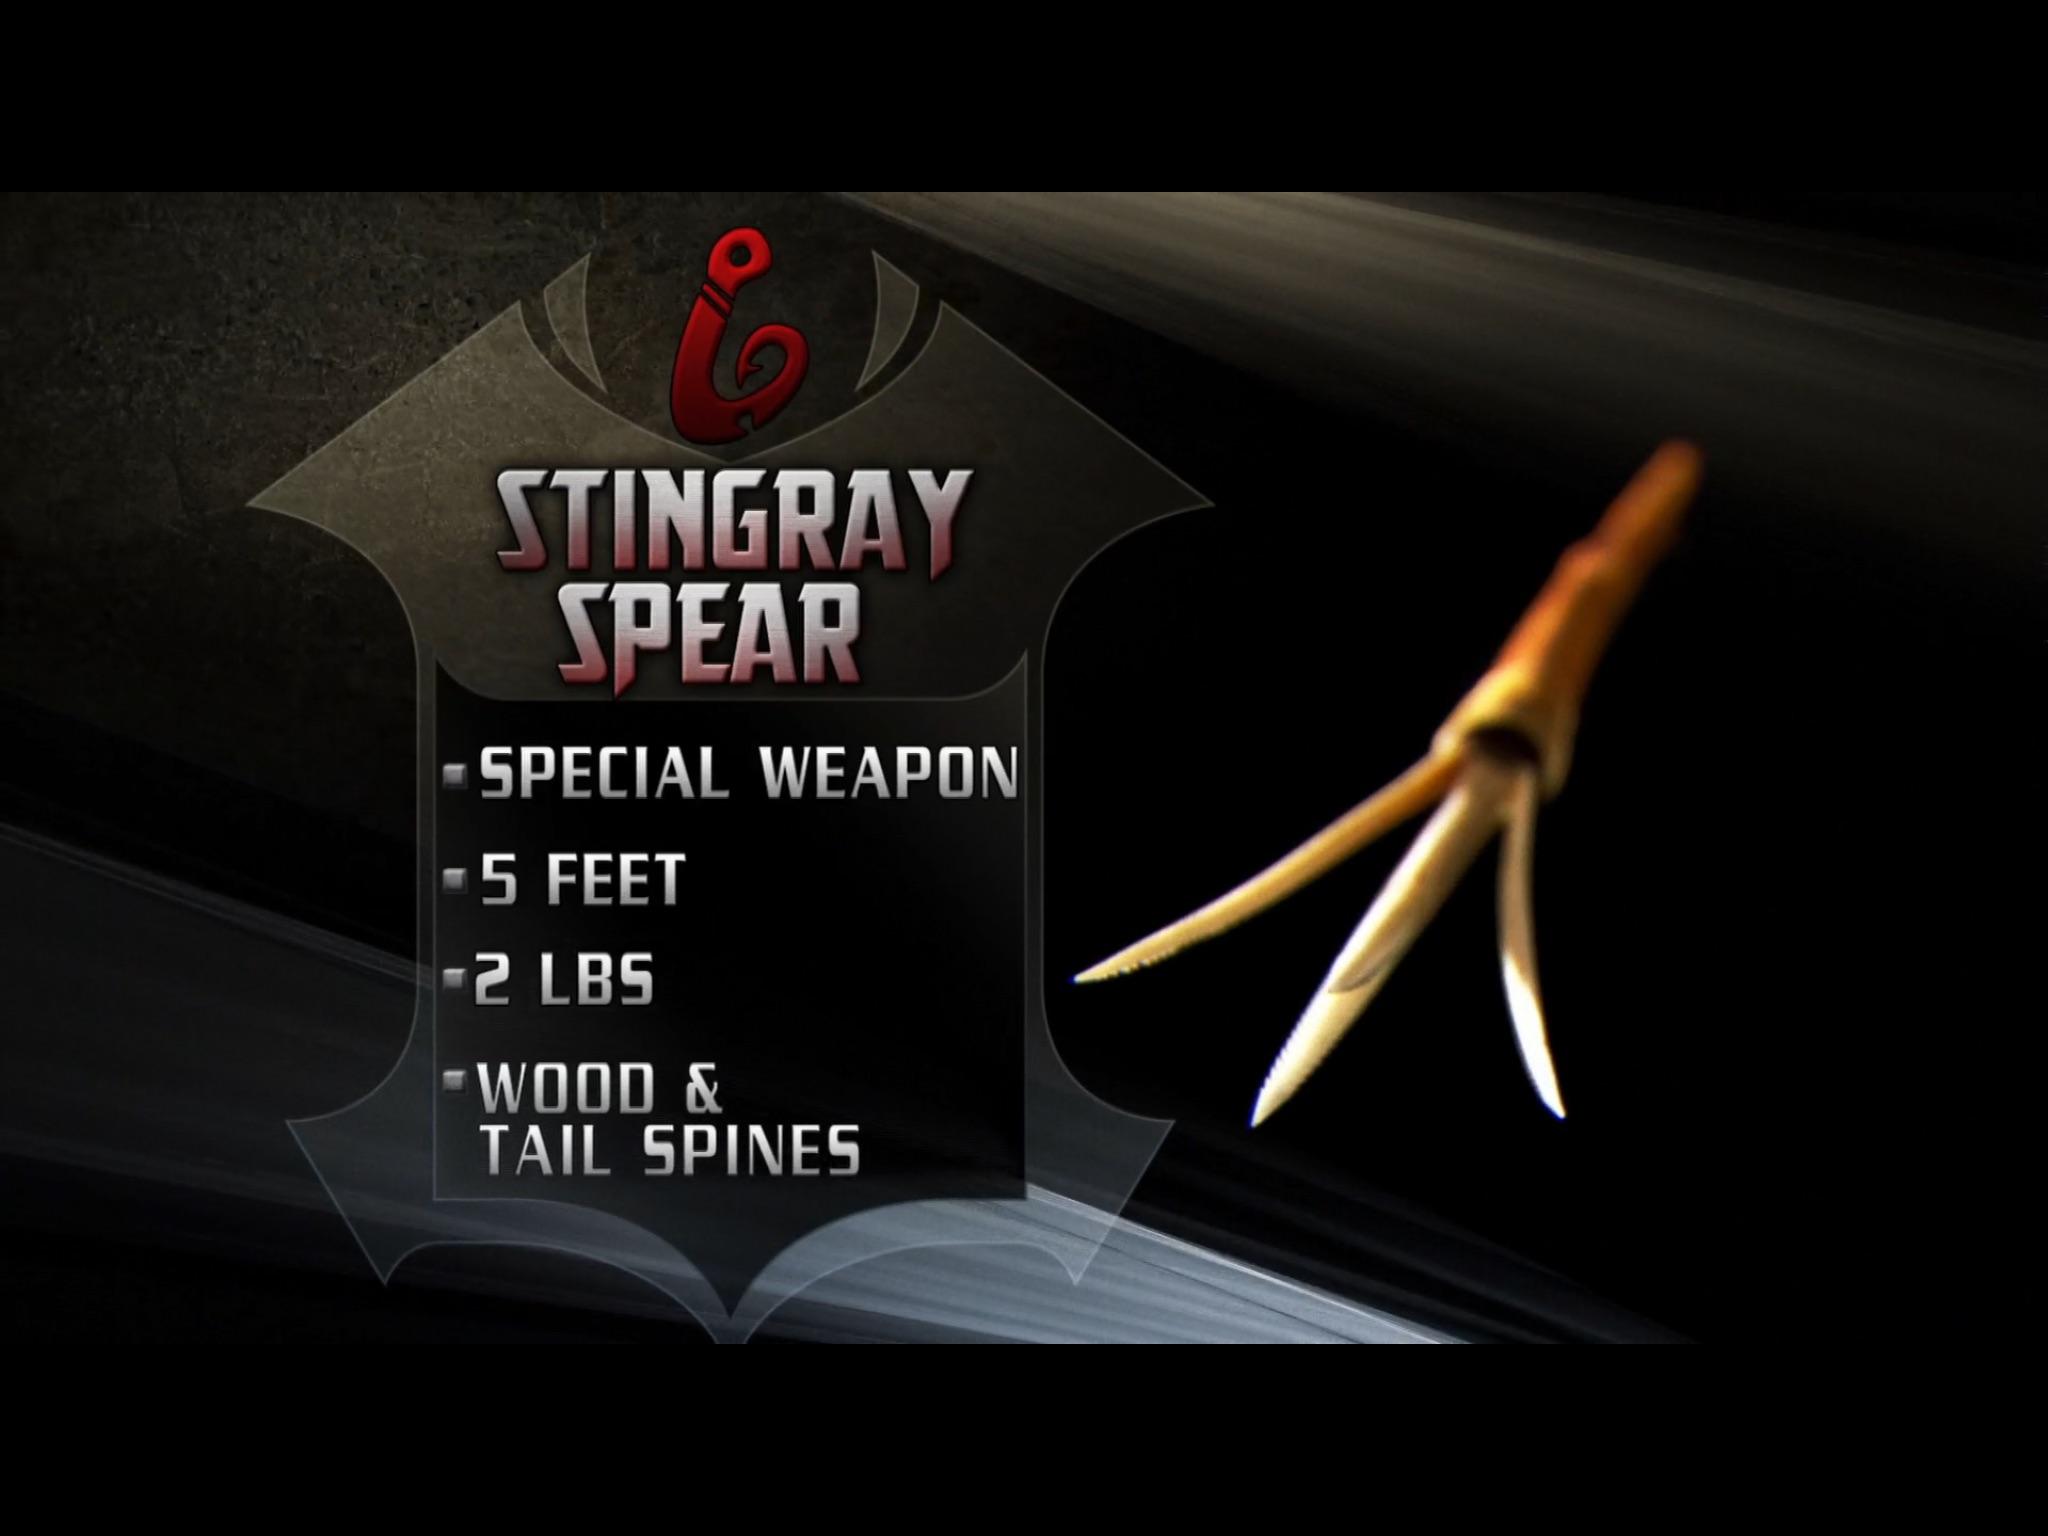 Stingray Spear